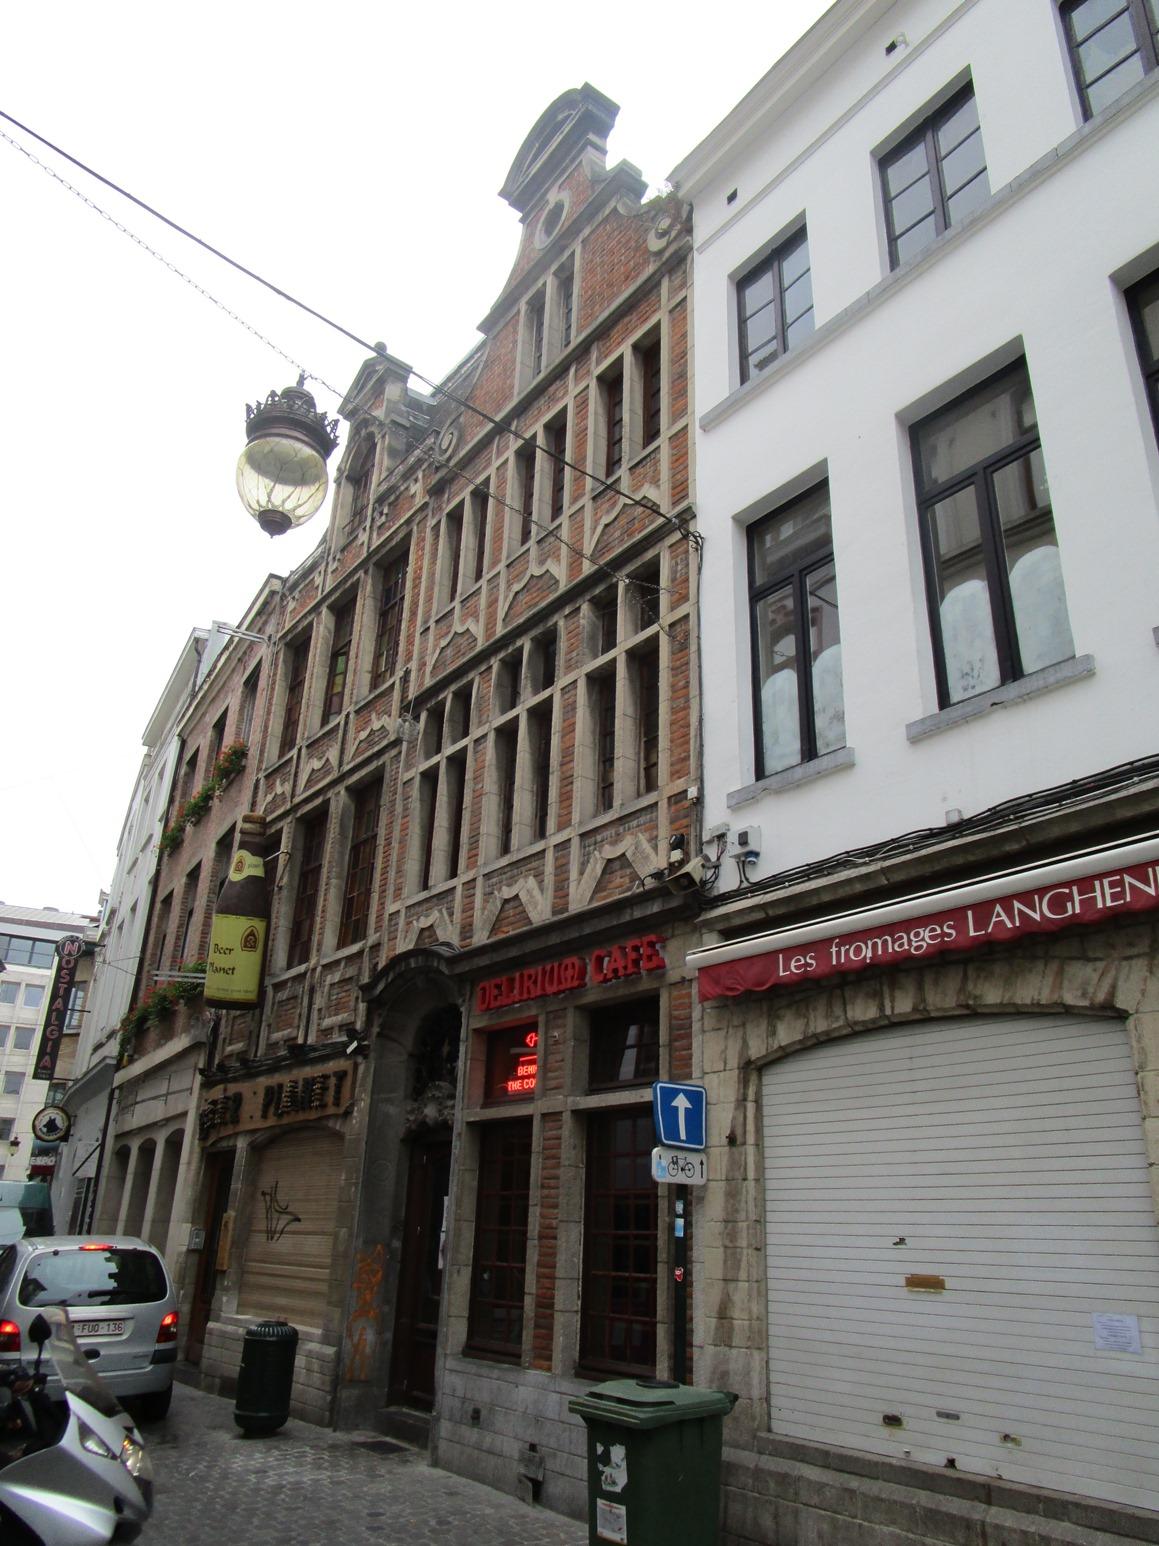 Greepstraat 43, 2015